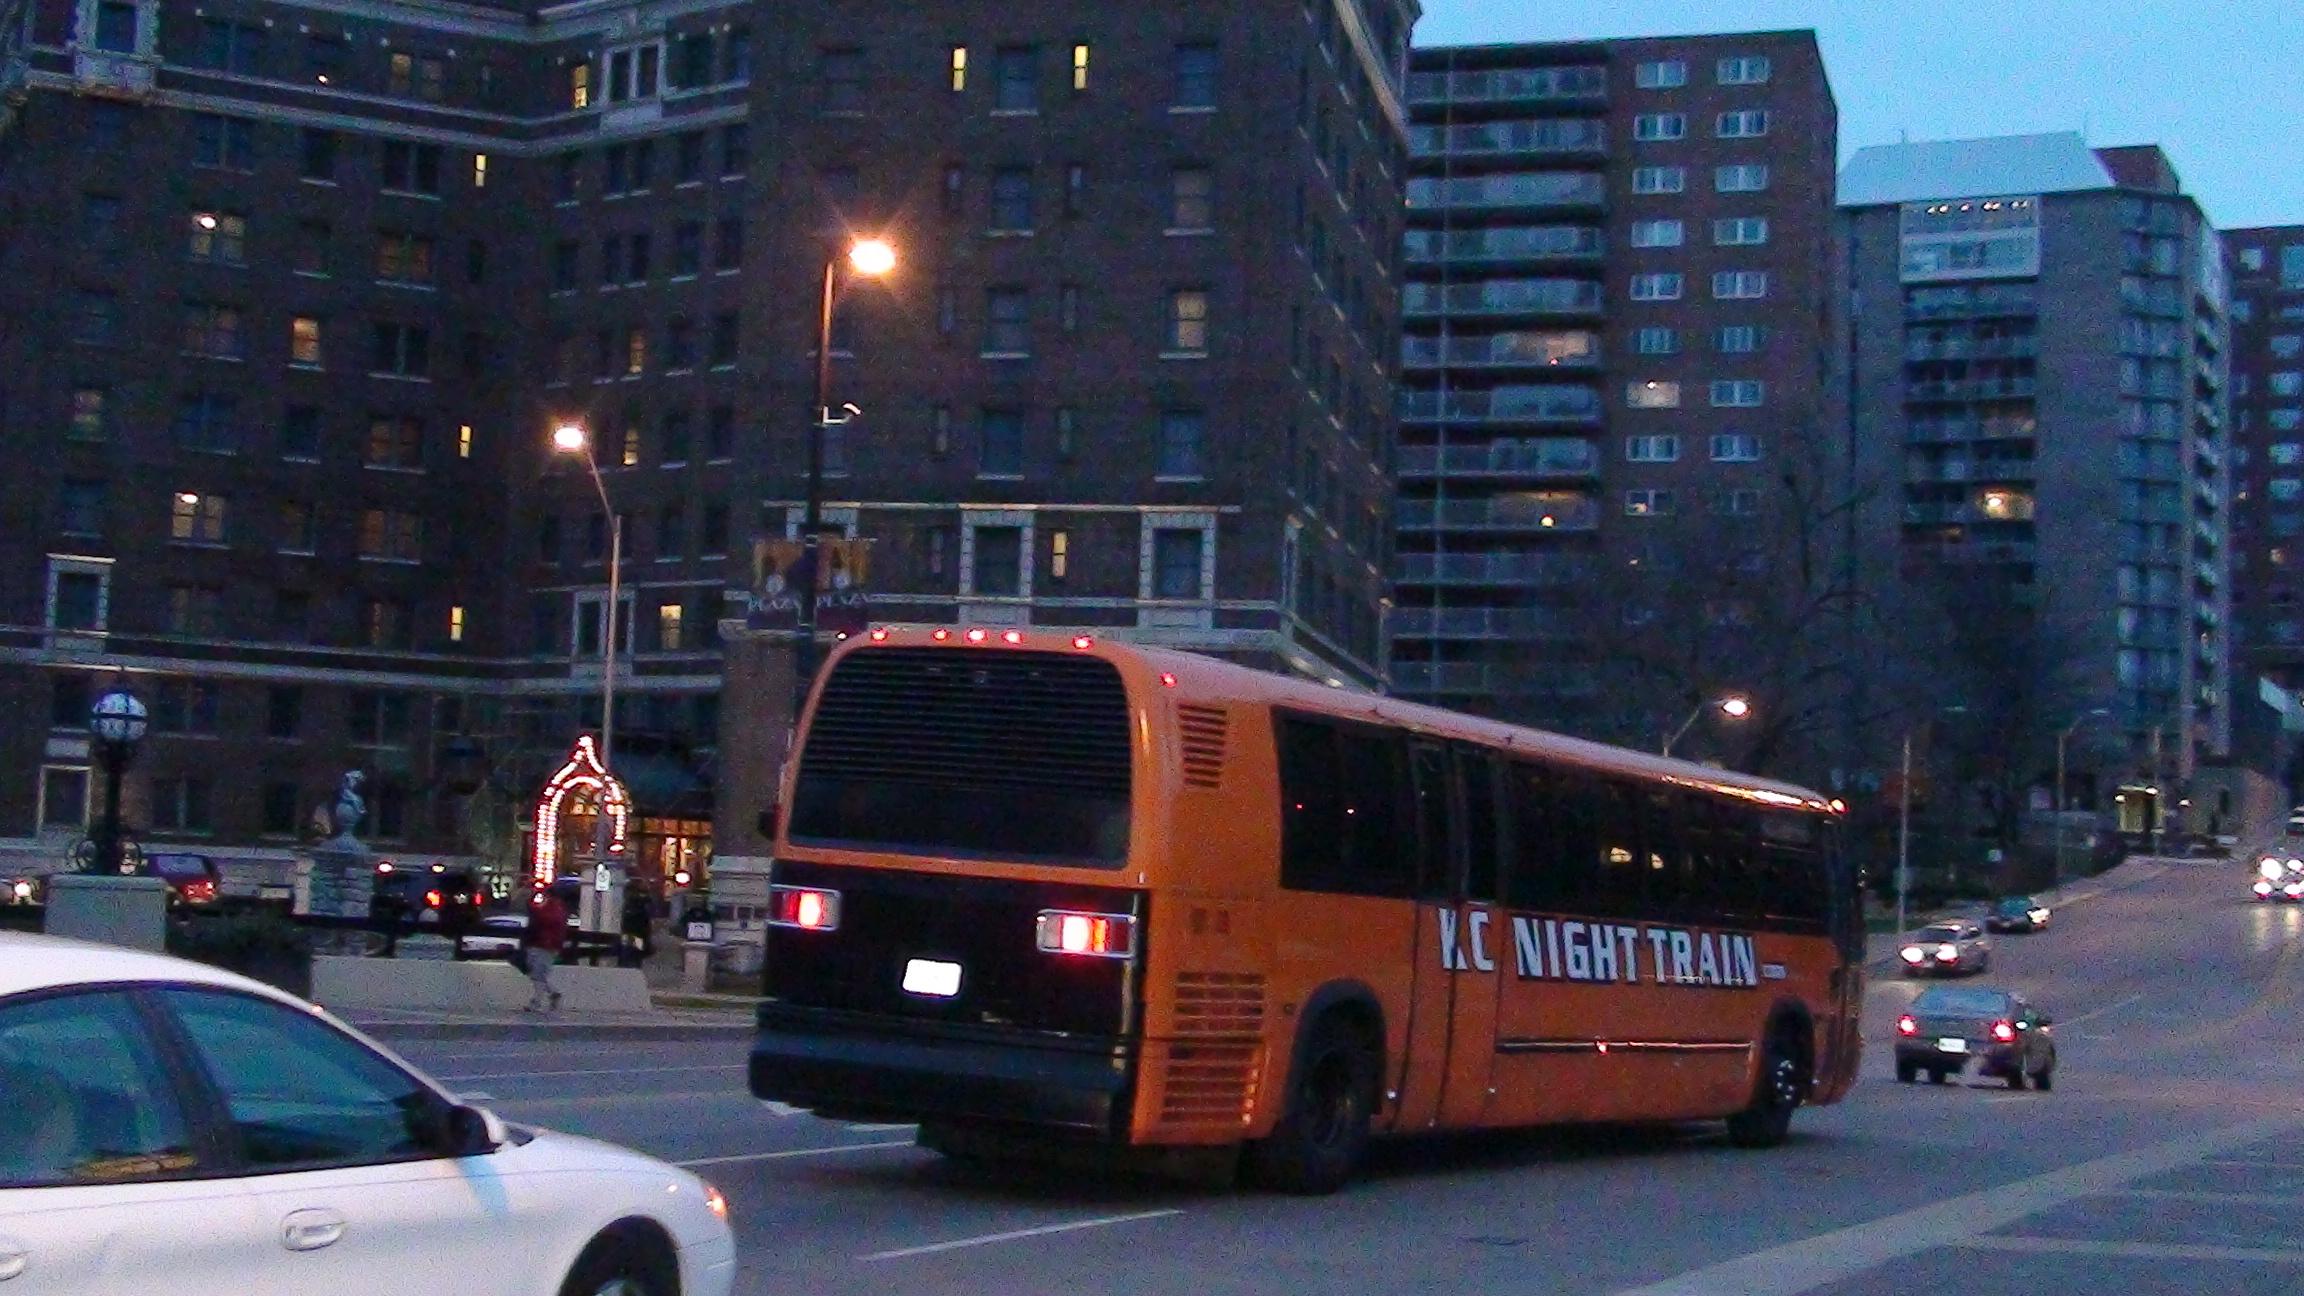 kansas-city-night-train-orange-party-bus-country-club-plaza